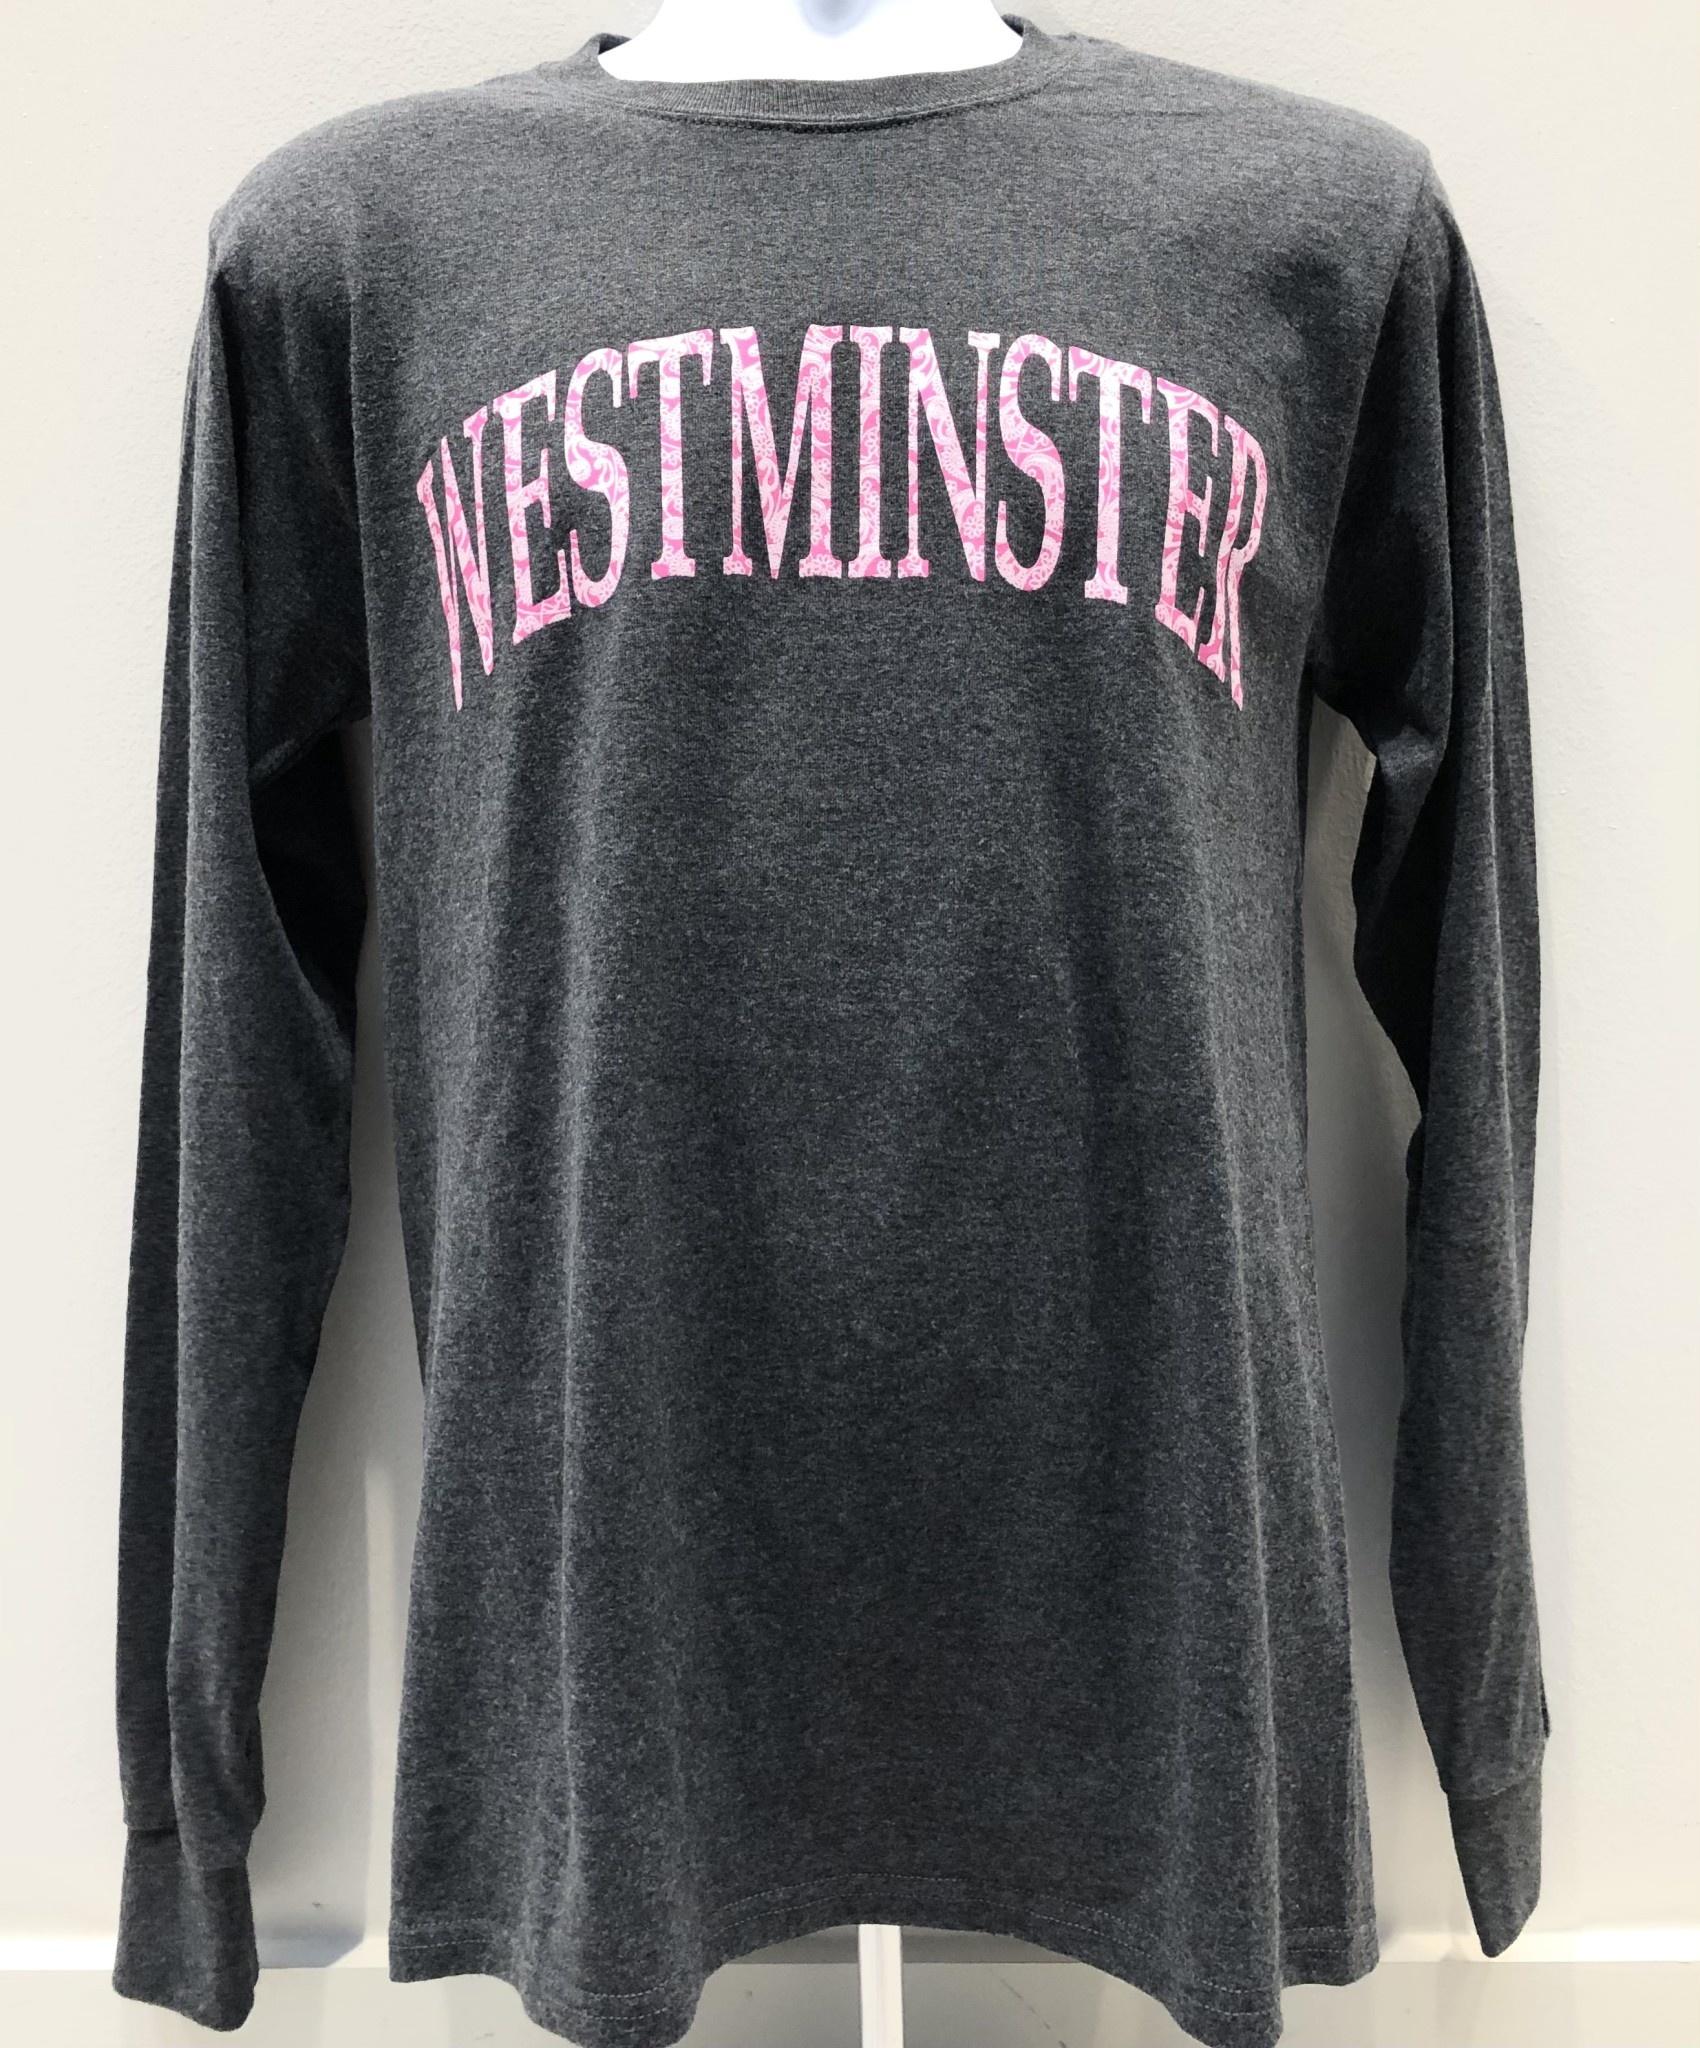 Champion T: Champion Women's Granite Heather LS Tee w/Pink Westminster Paisley